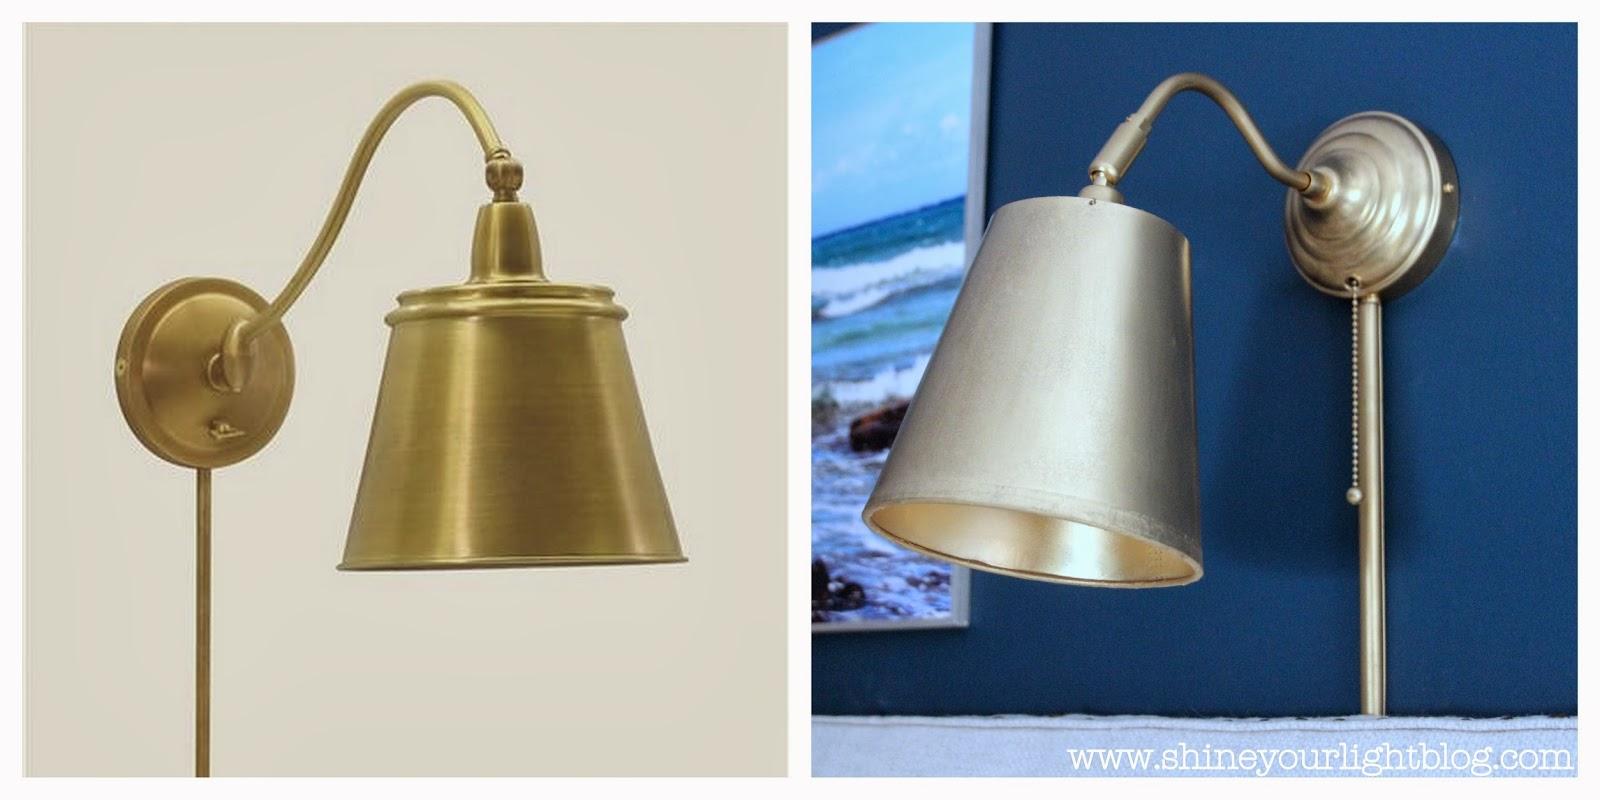 shine your light ikea wall light hack. Black Bedroom Furniture Sets. Home Design Ideas